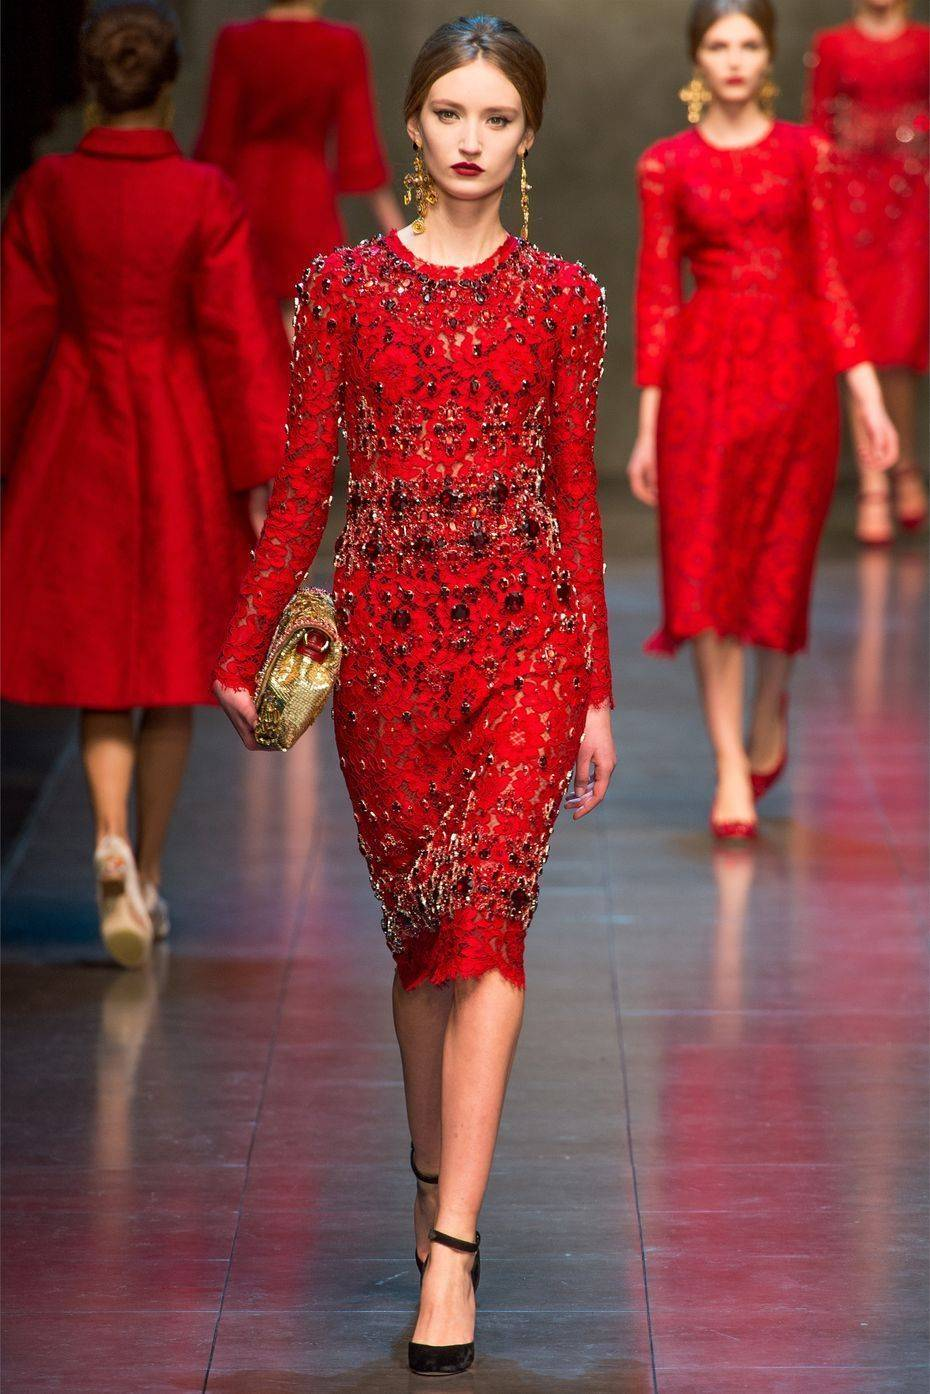 Top fashion dresses 2014